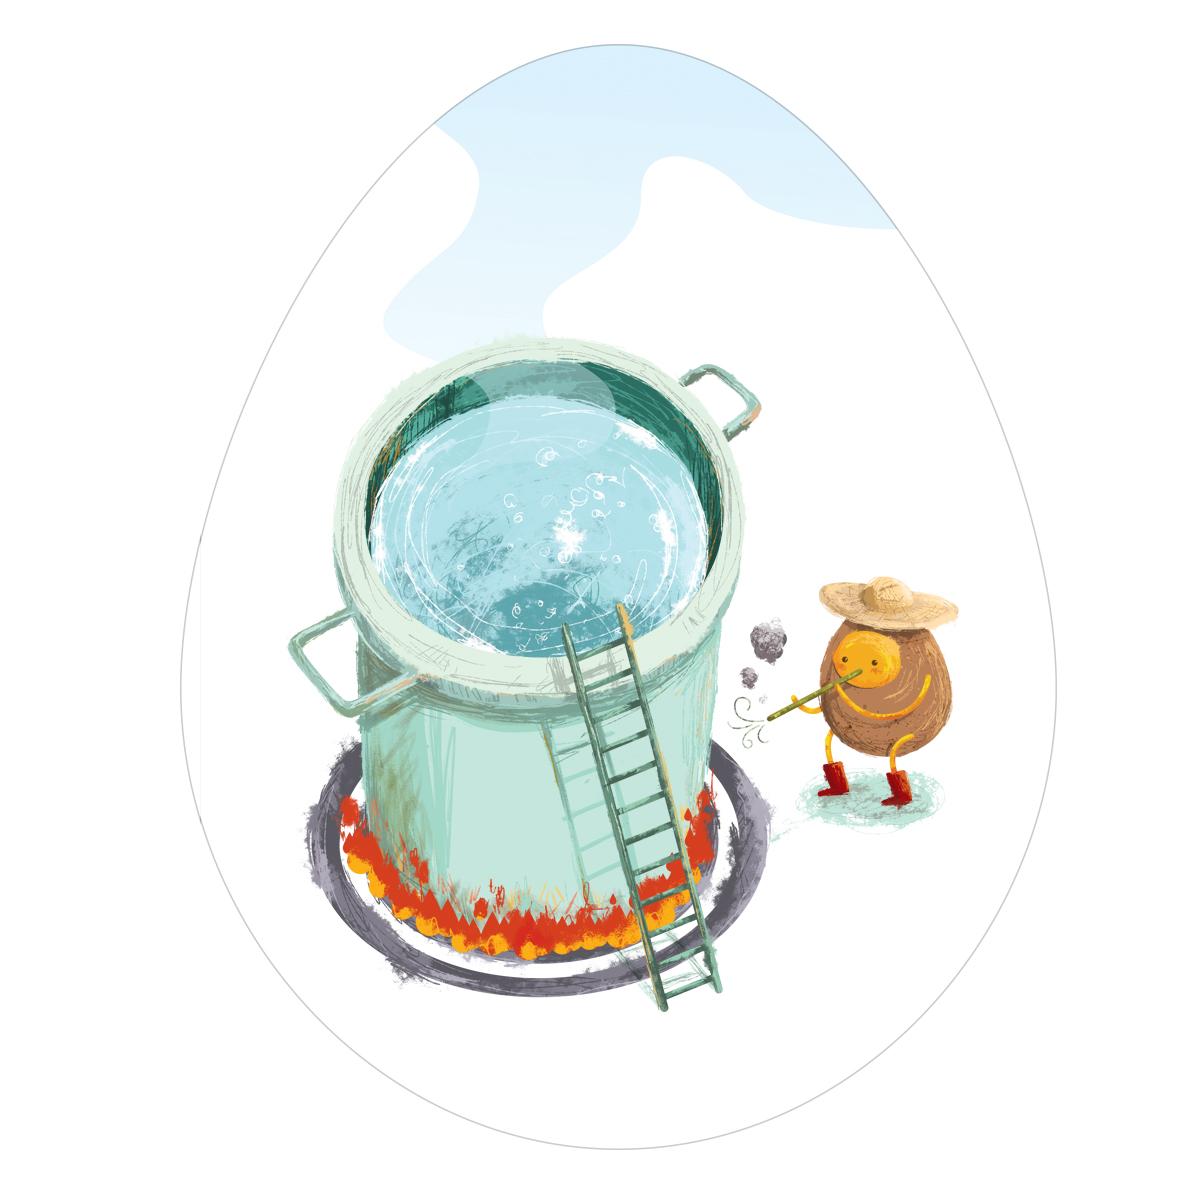 Eggfographic_forweb3.jpg